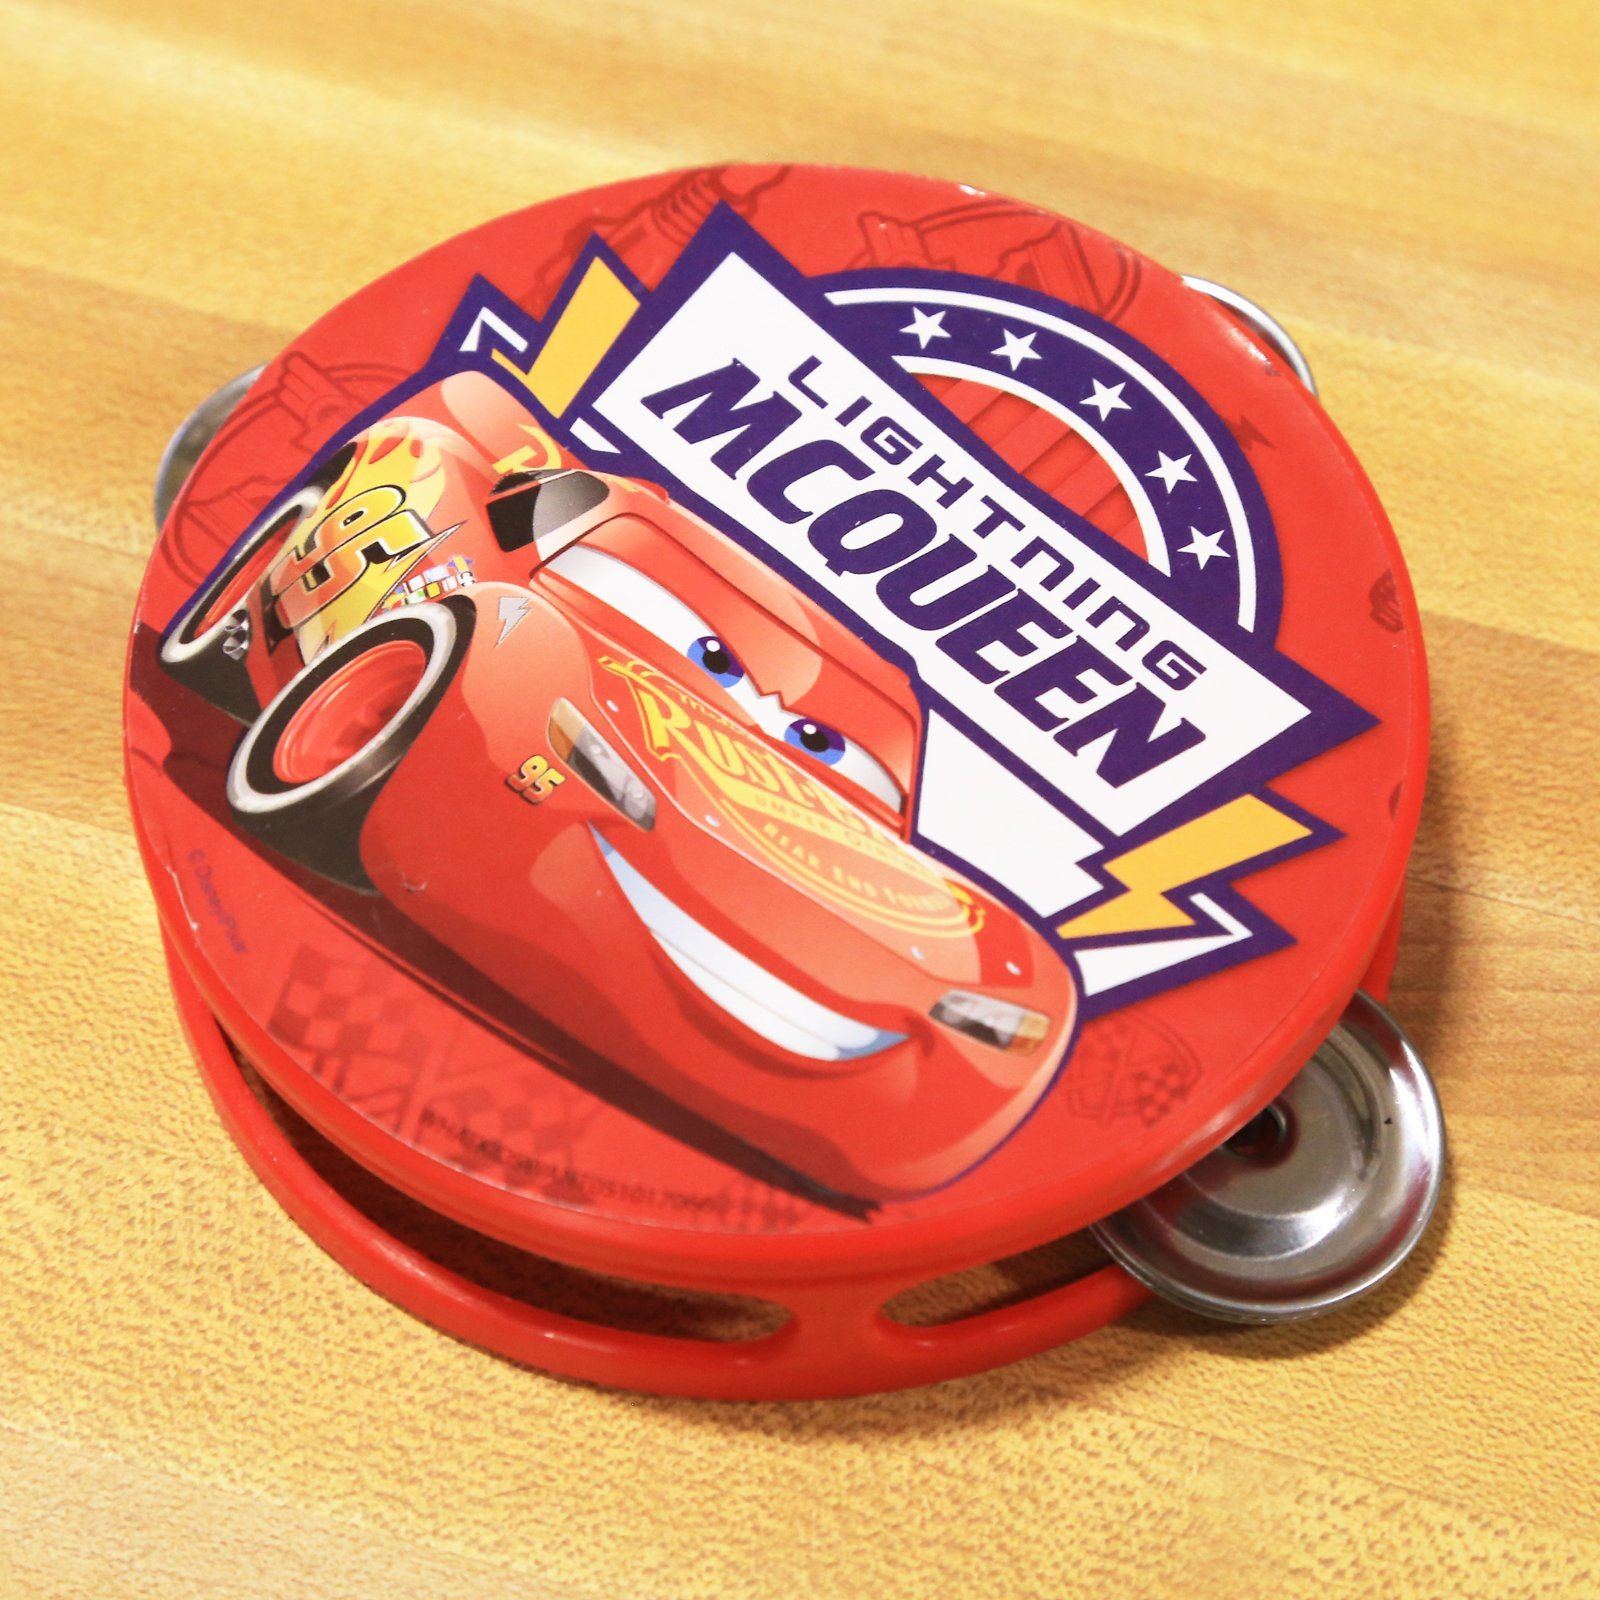 Disney Pixar Cars 3 Kids Tambourine Educational Musical Instrument Toy Gift